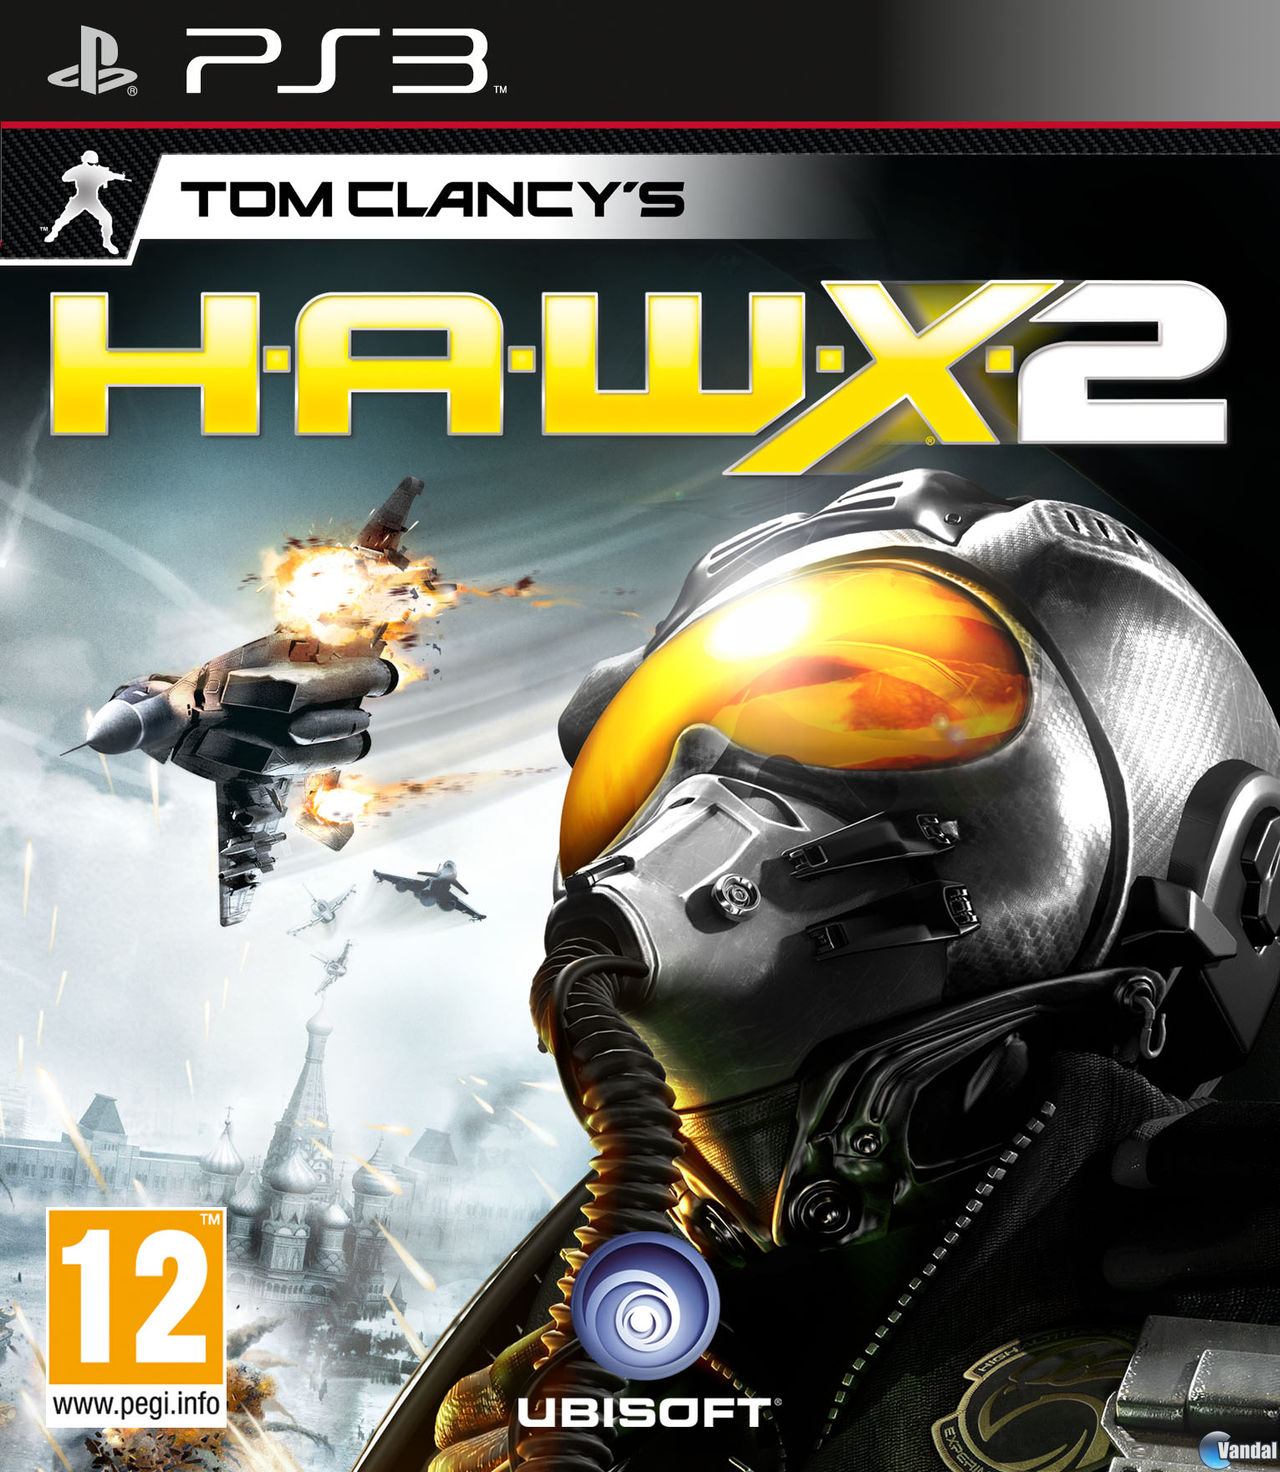 Tom Clancy's H.A.W.X.2 SEMINUEVO